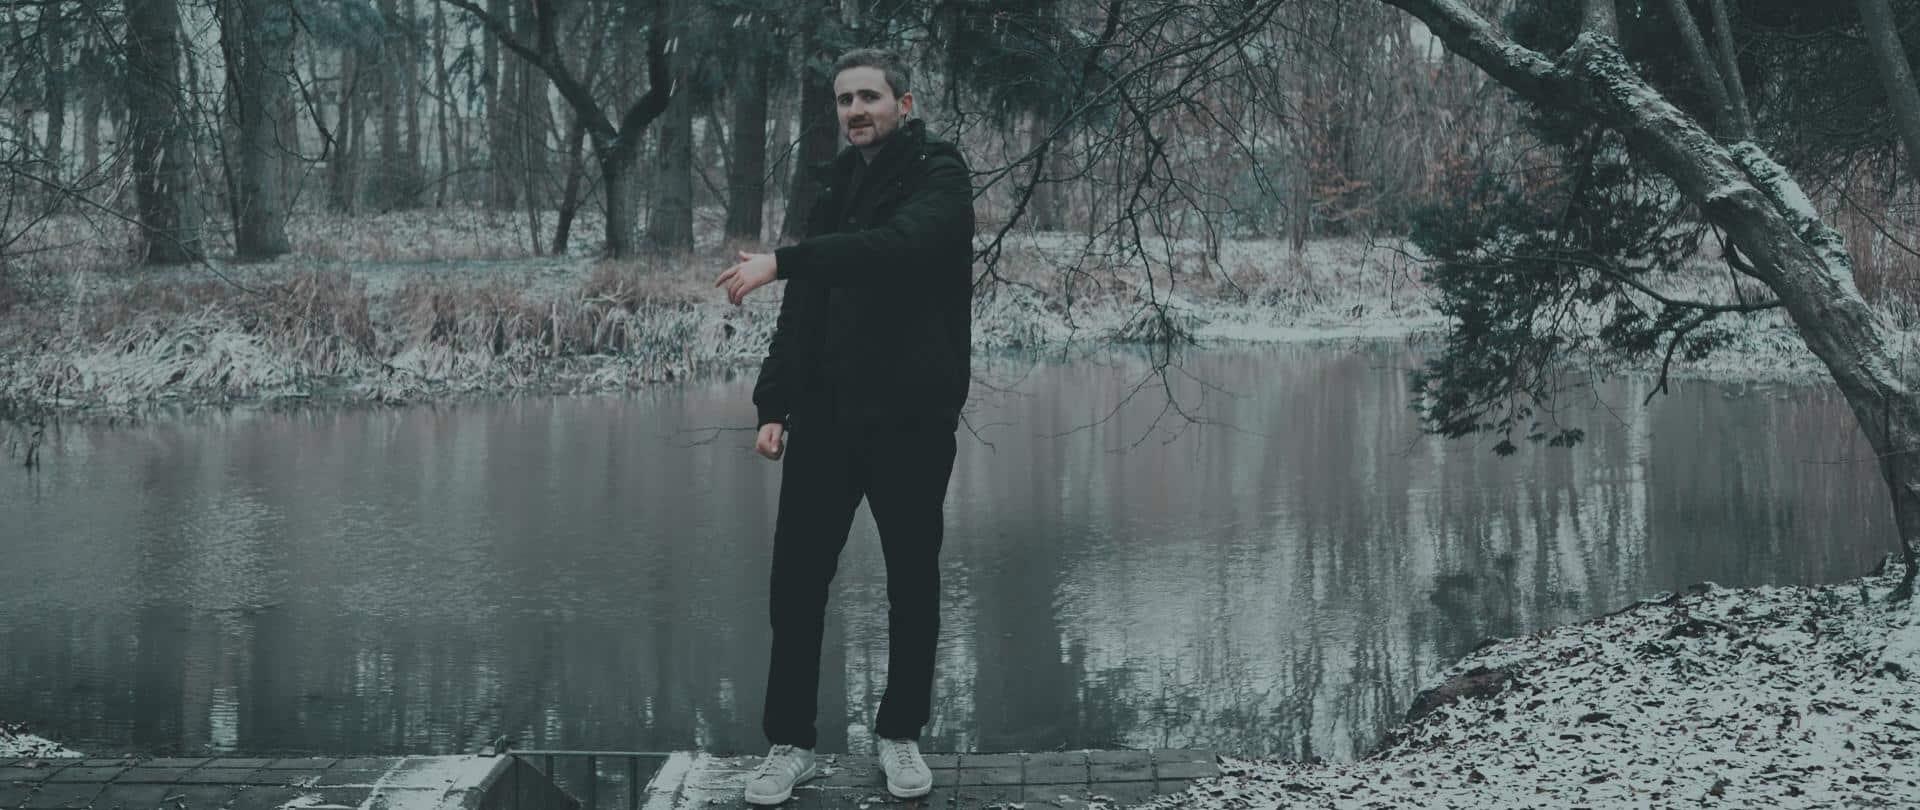 Blazin'Daniel - No Name (Musikvideo).00_02_28_14.Standbild253